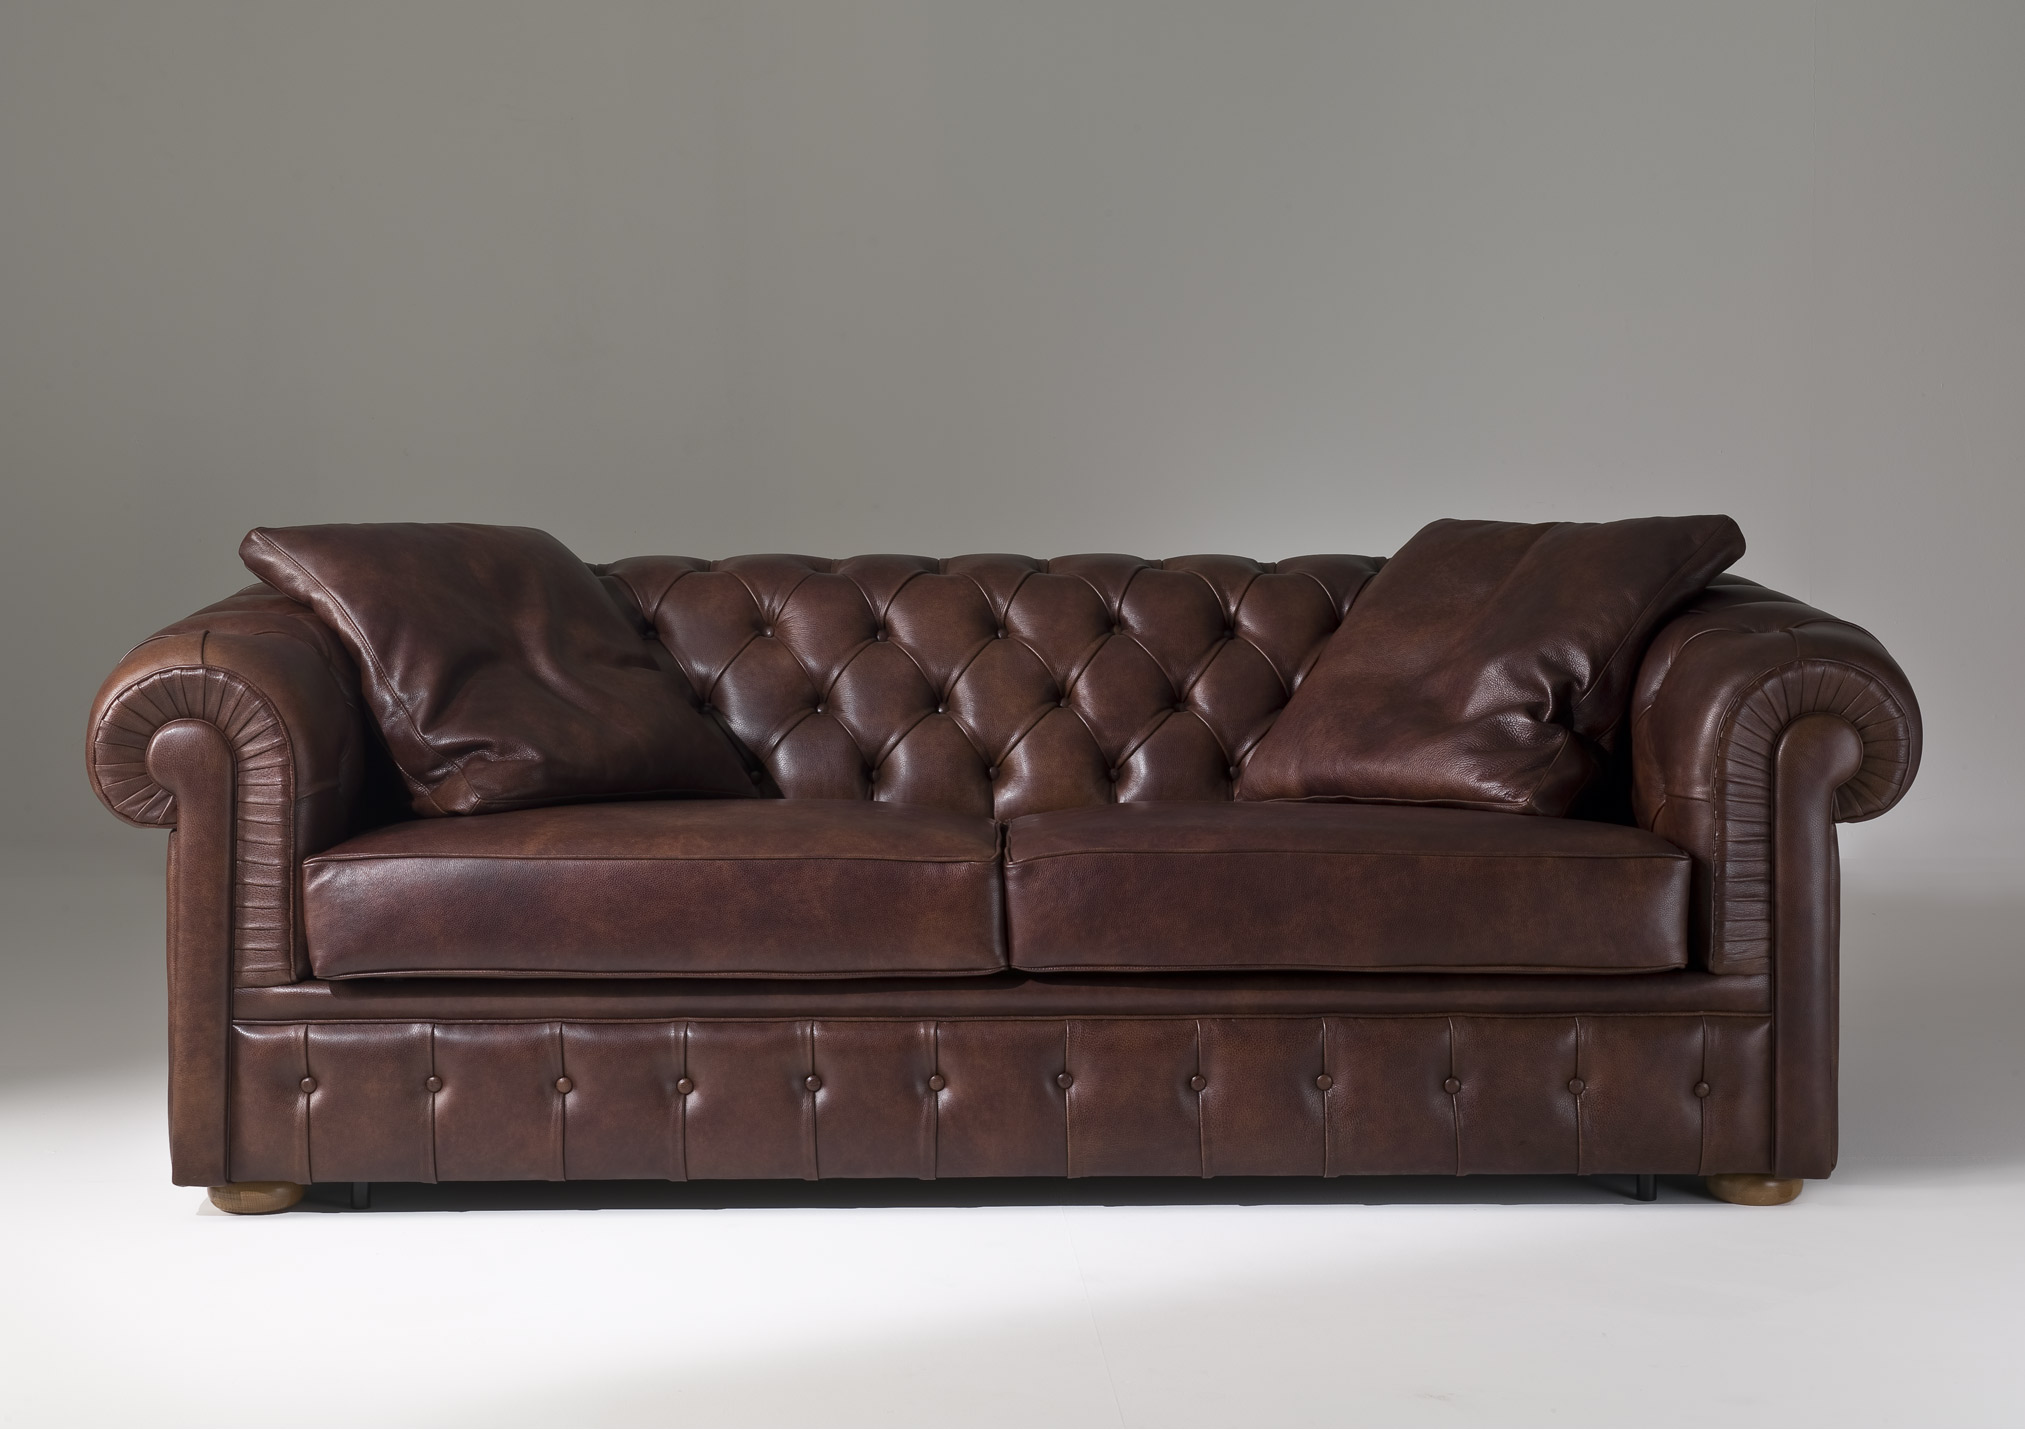 chesterfield sofa polster couch 3 sitzer schlafsofa bettfunktion leder sofas ebay